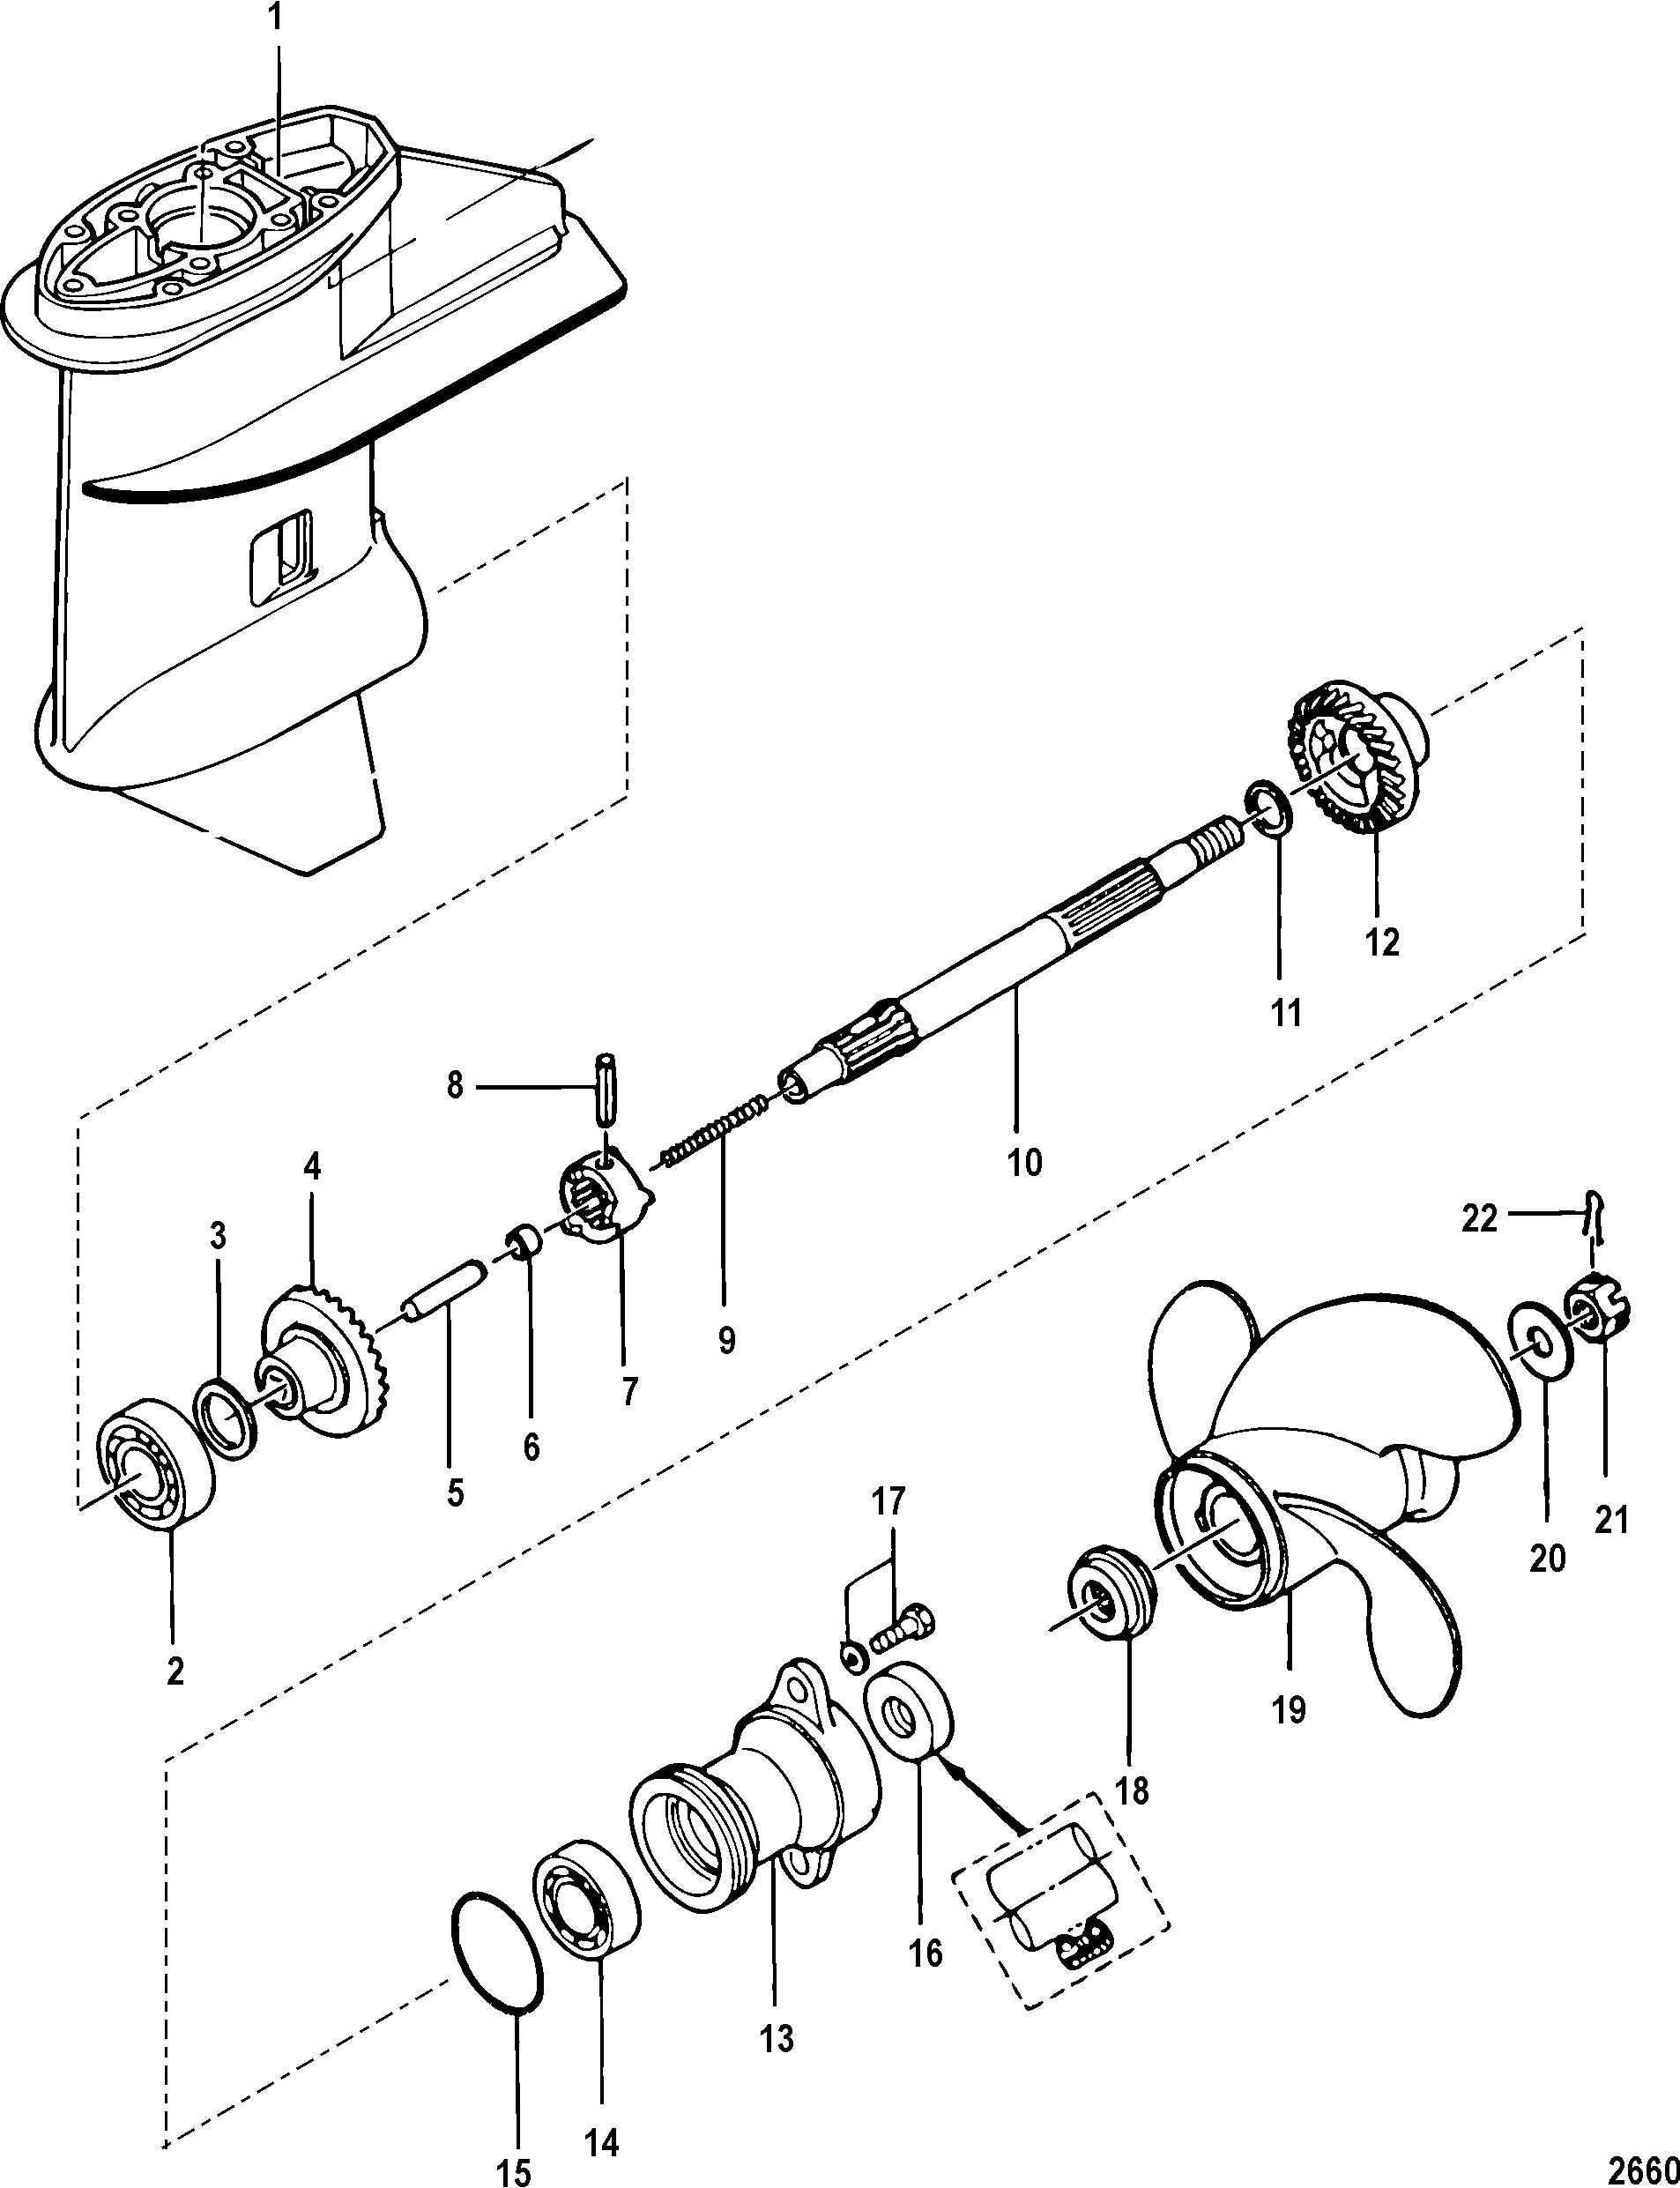 Gear housing propeller shaft non bigfoot for mariner mercury 8 9 9 209cc 4 stroke